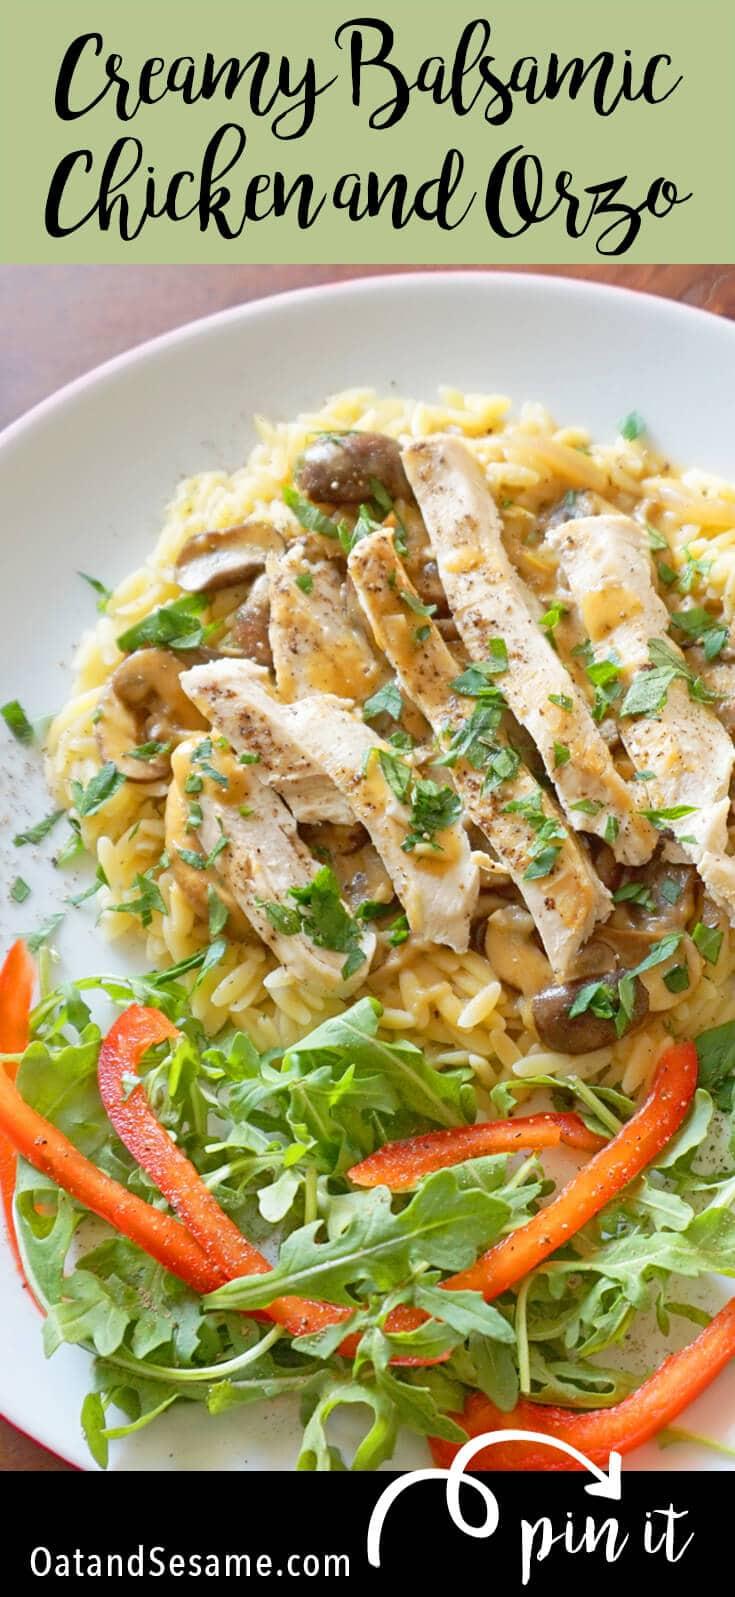 Chicken and Mushroom Pasta